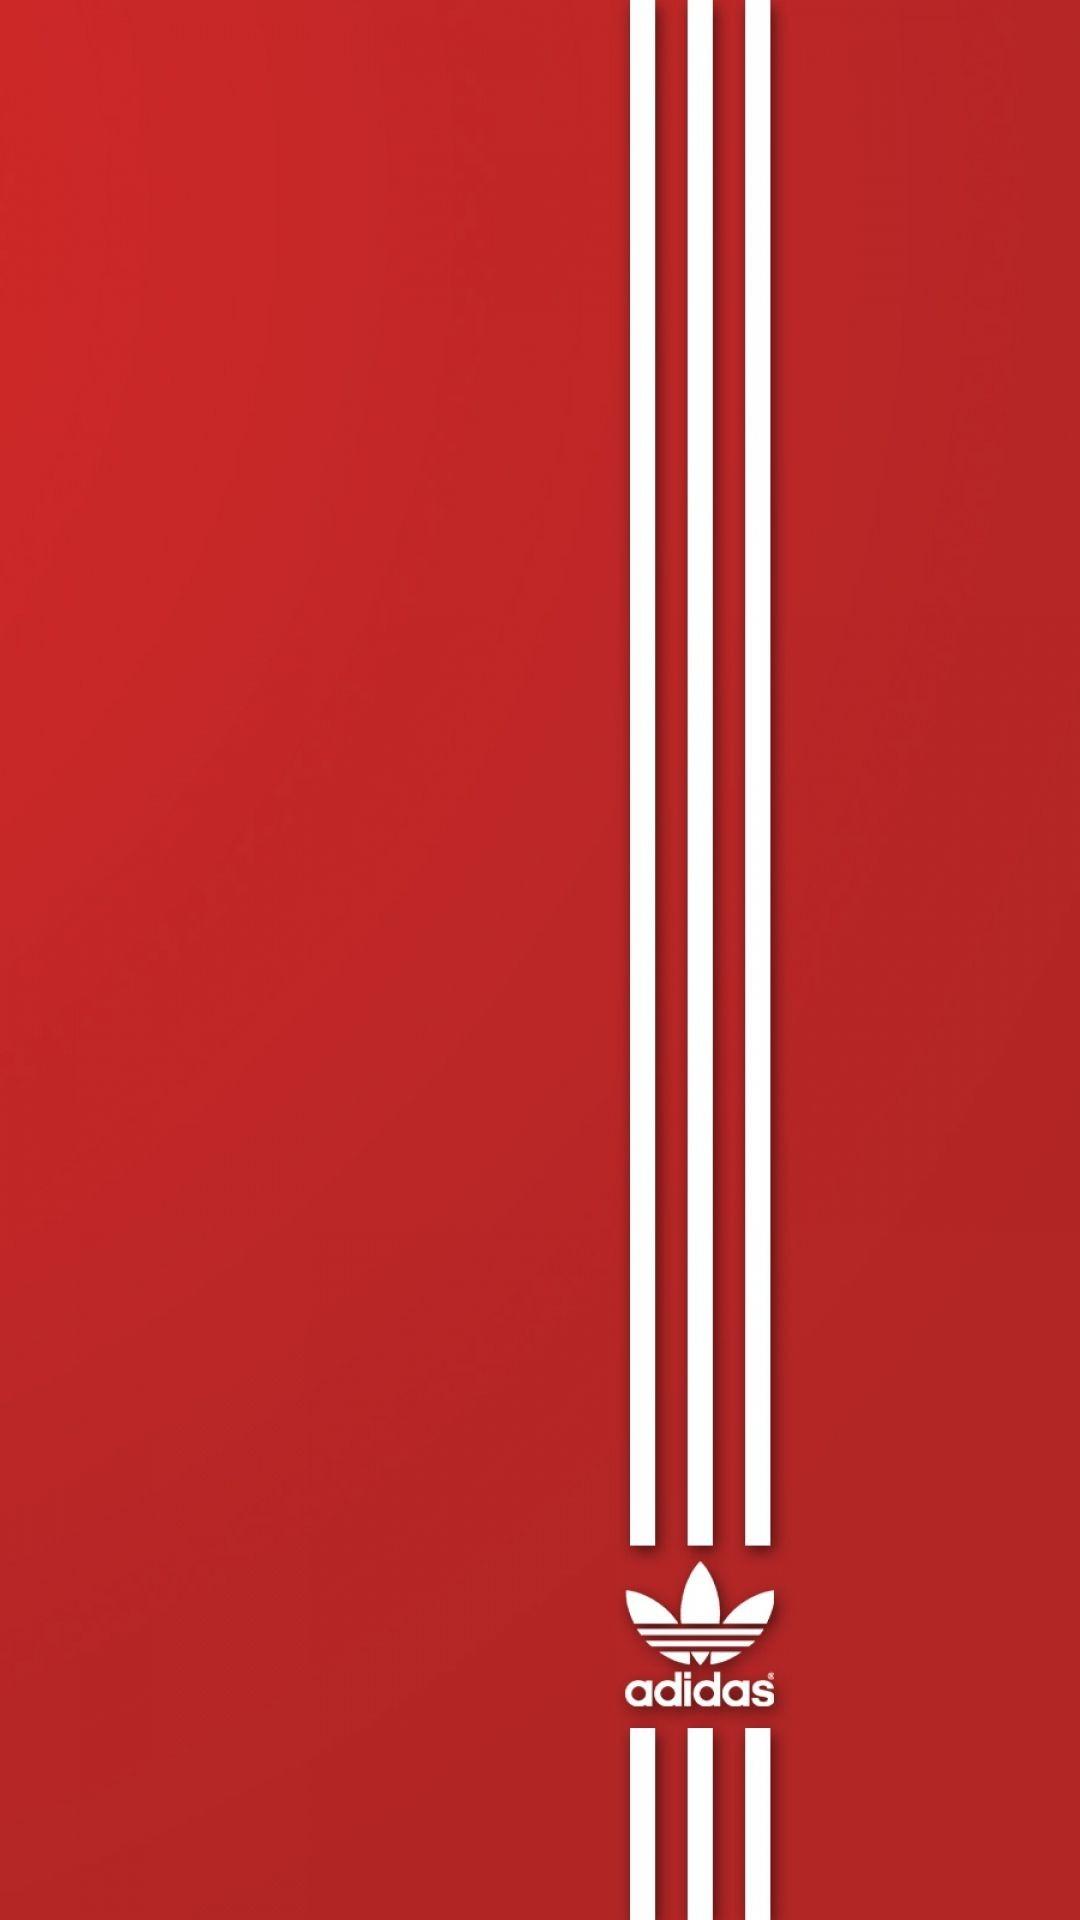 Adidas Originals Logo Wallpaper 57 Images